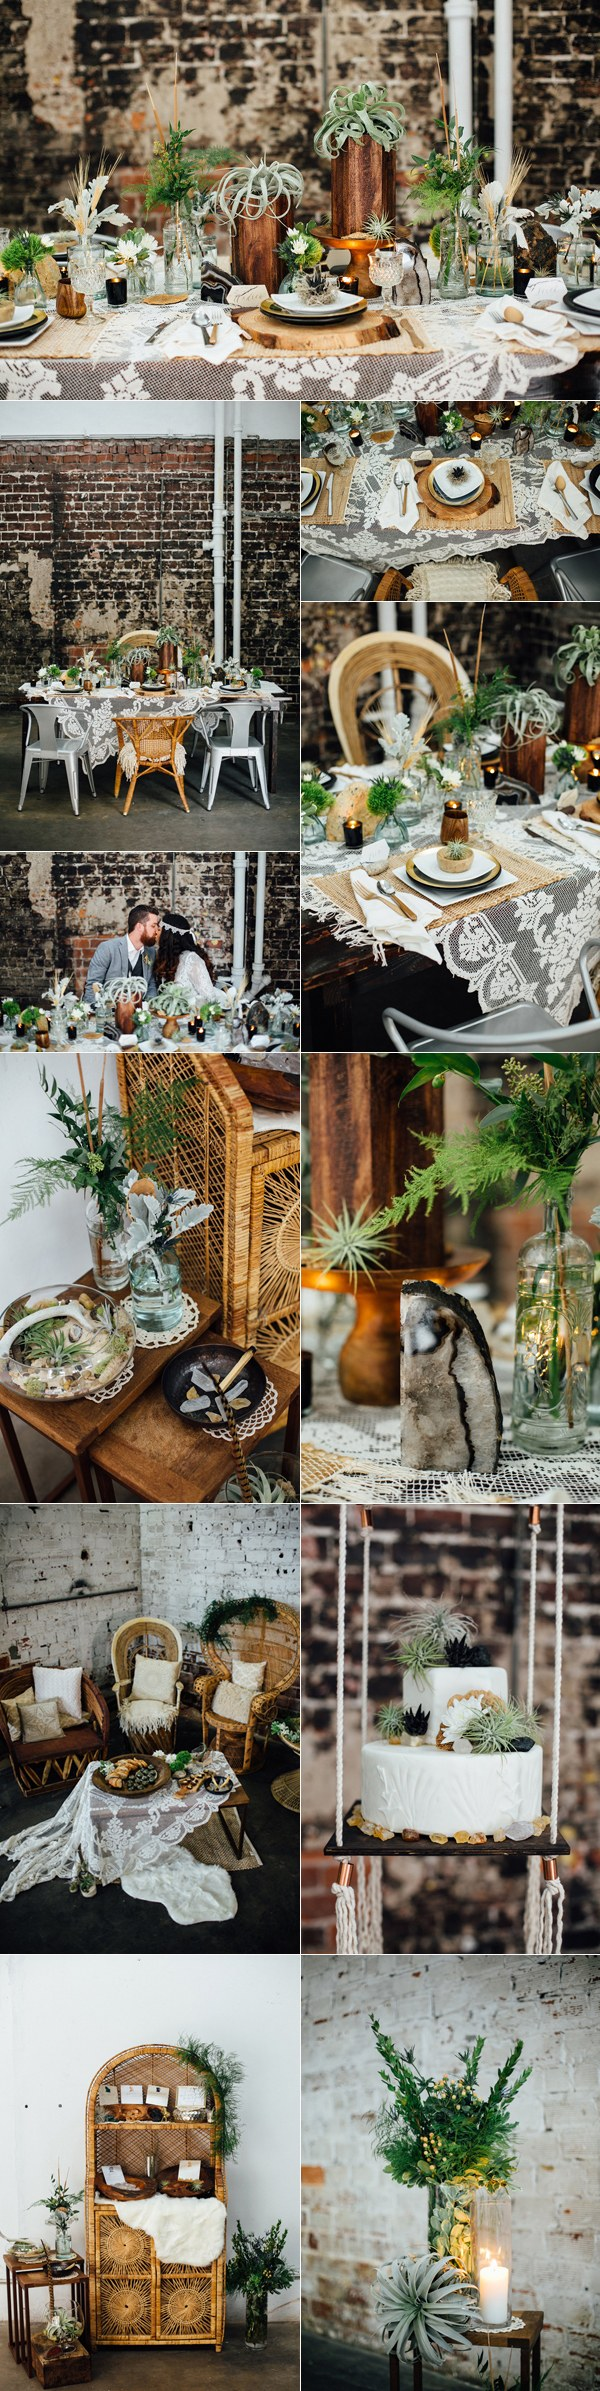 earthy industrial bohemian wedding ideas